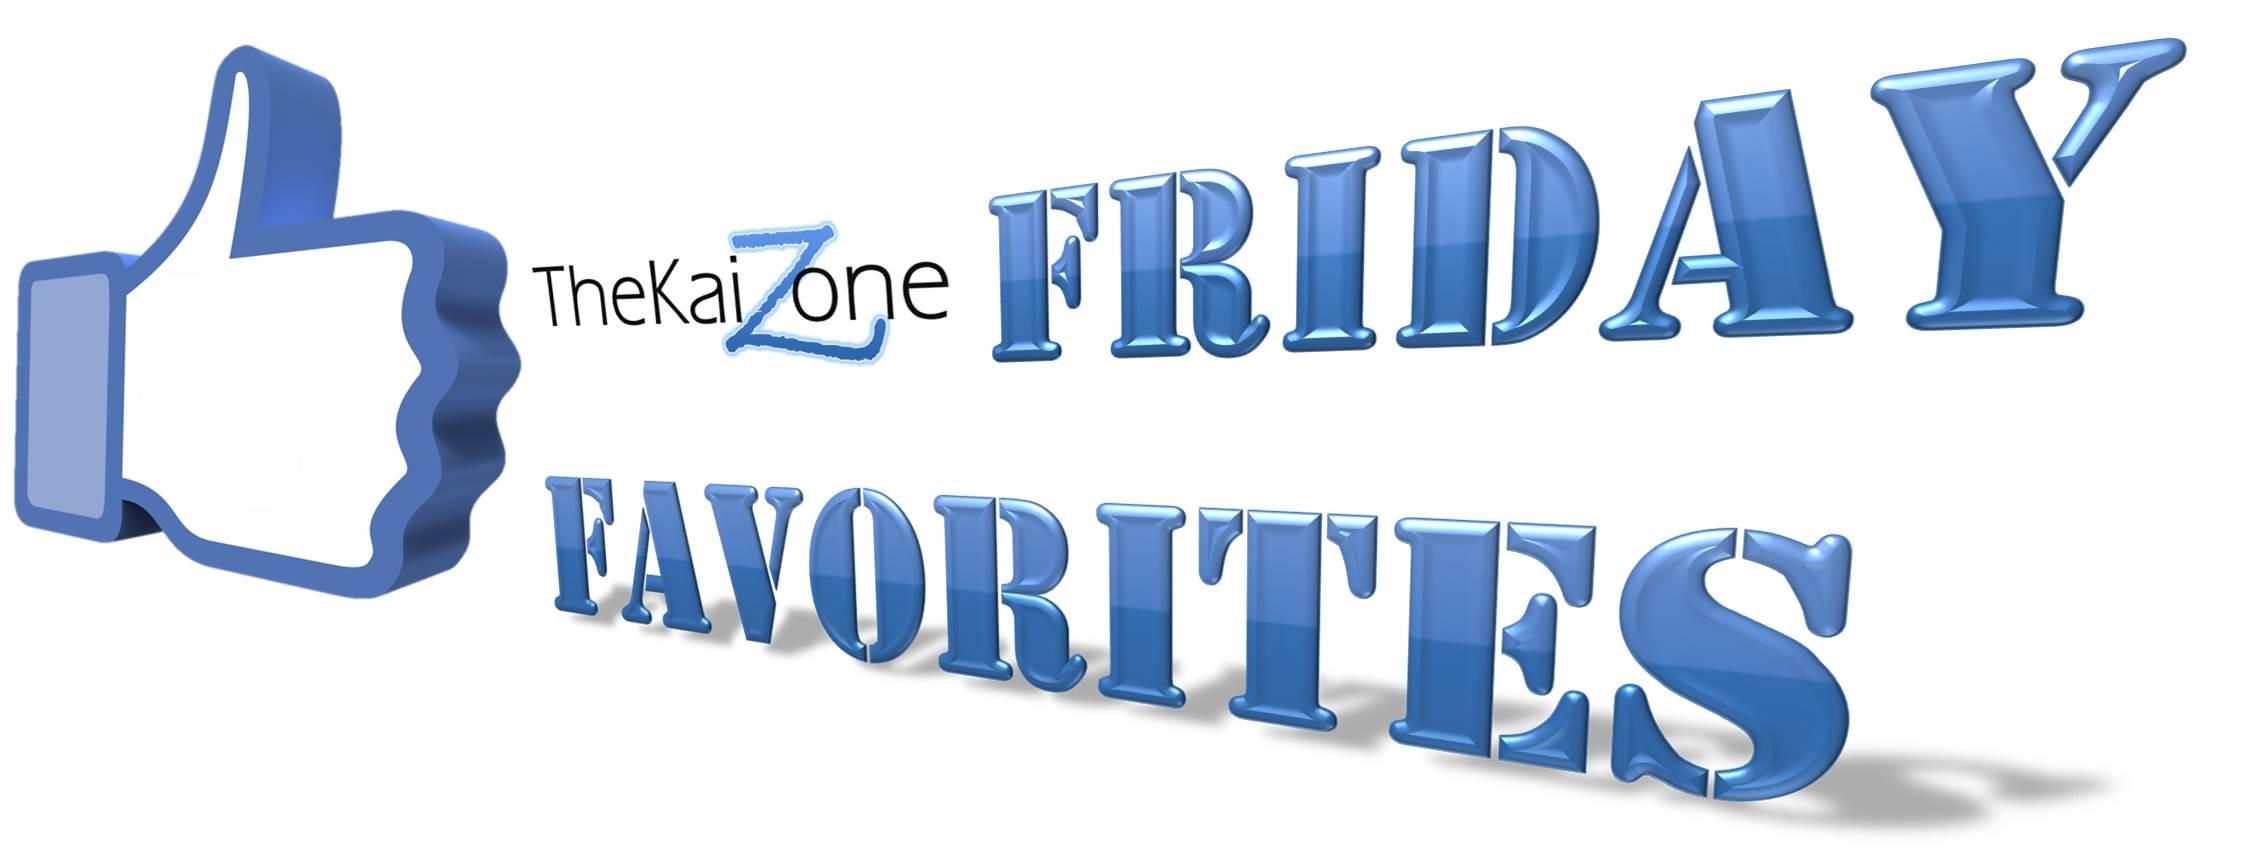 The New KaiZone Friday Favorites